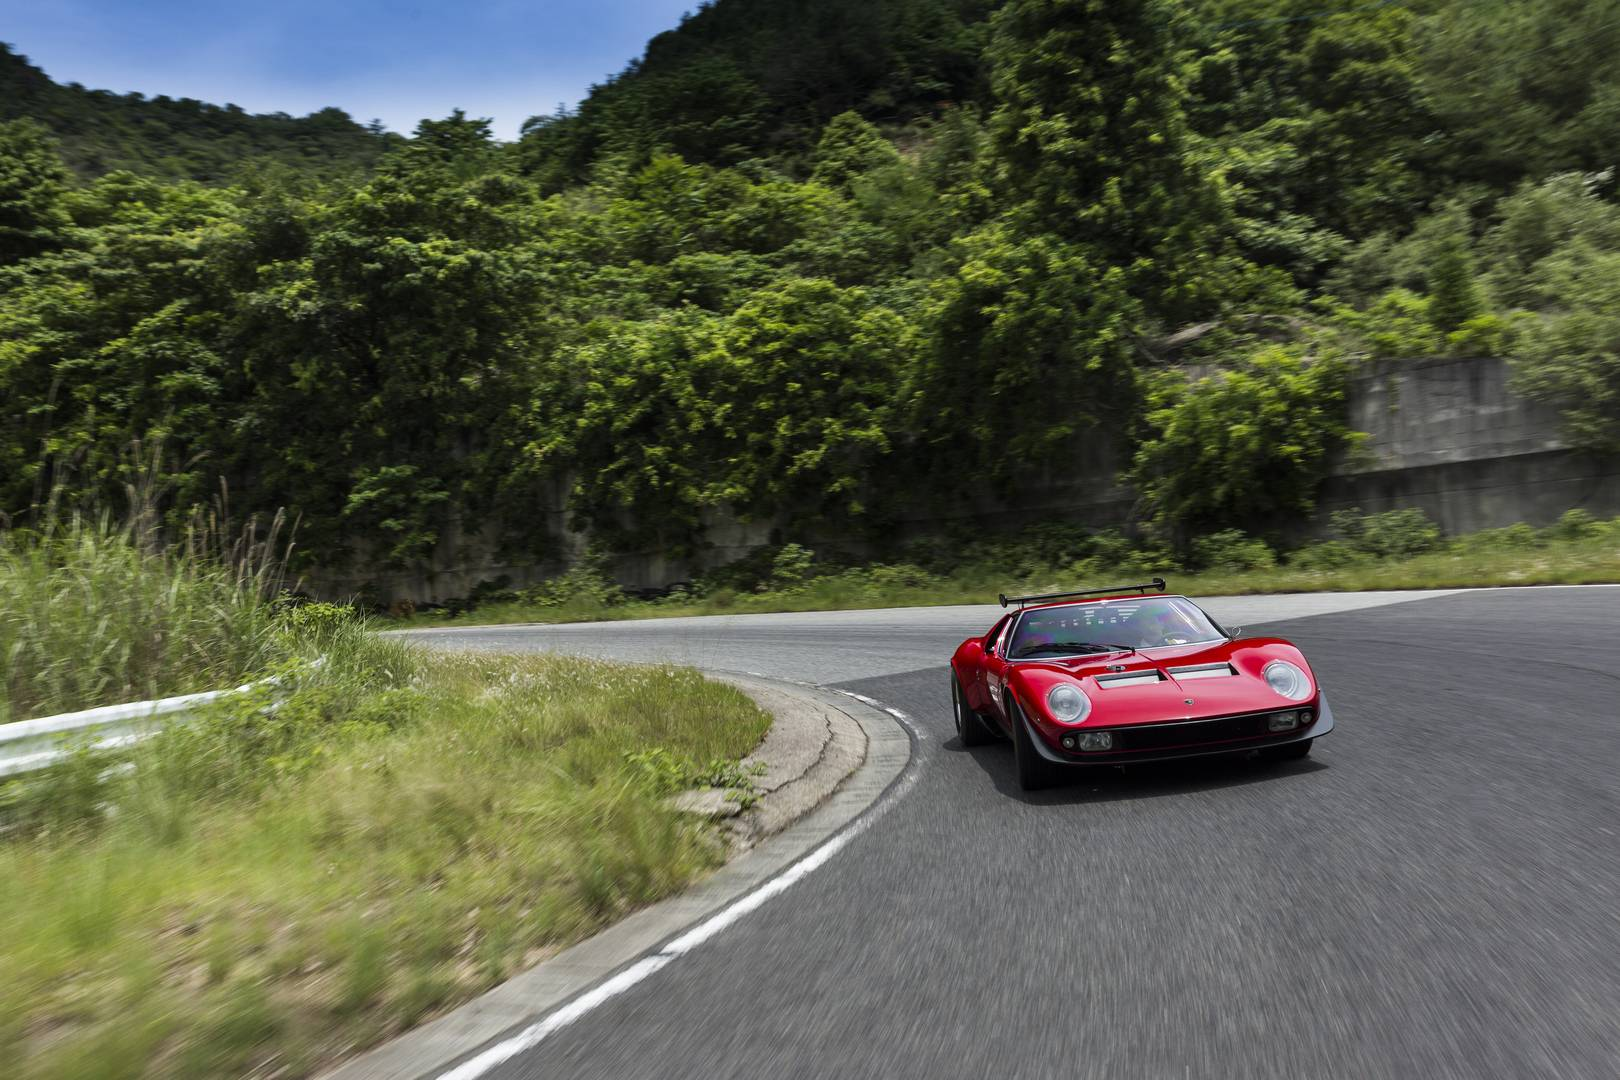 Lamborghini недавно объявил, что отдел Lamborghini Polo Storico завершил восстановление своей Miura.